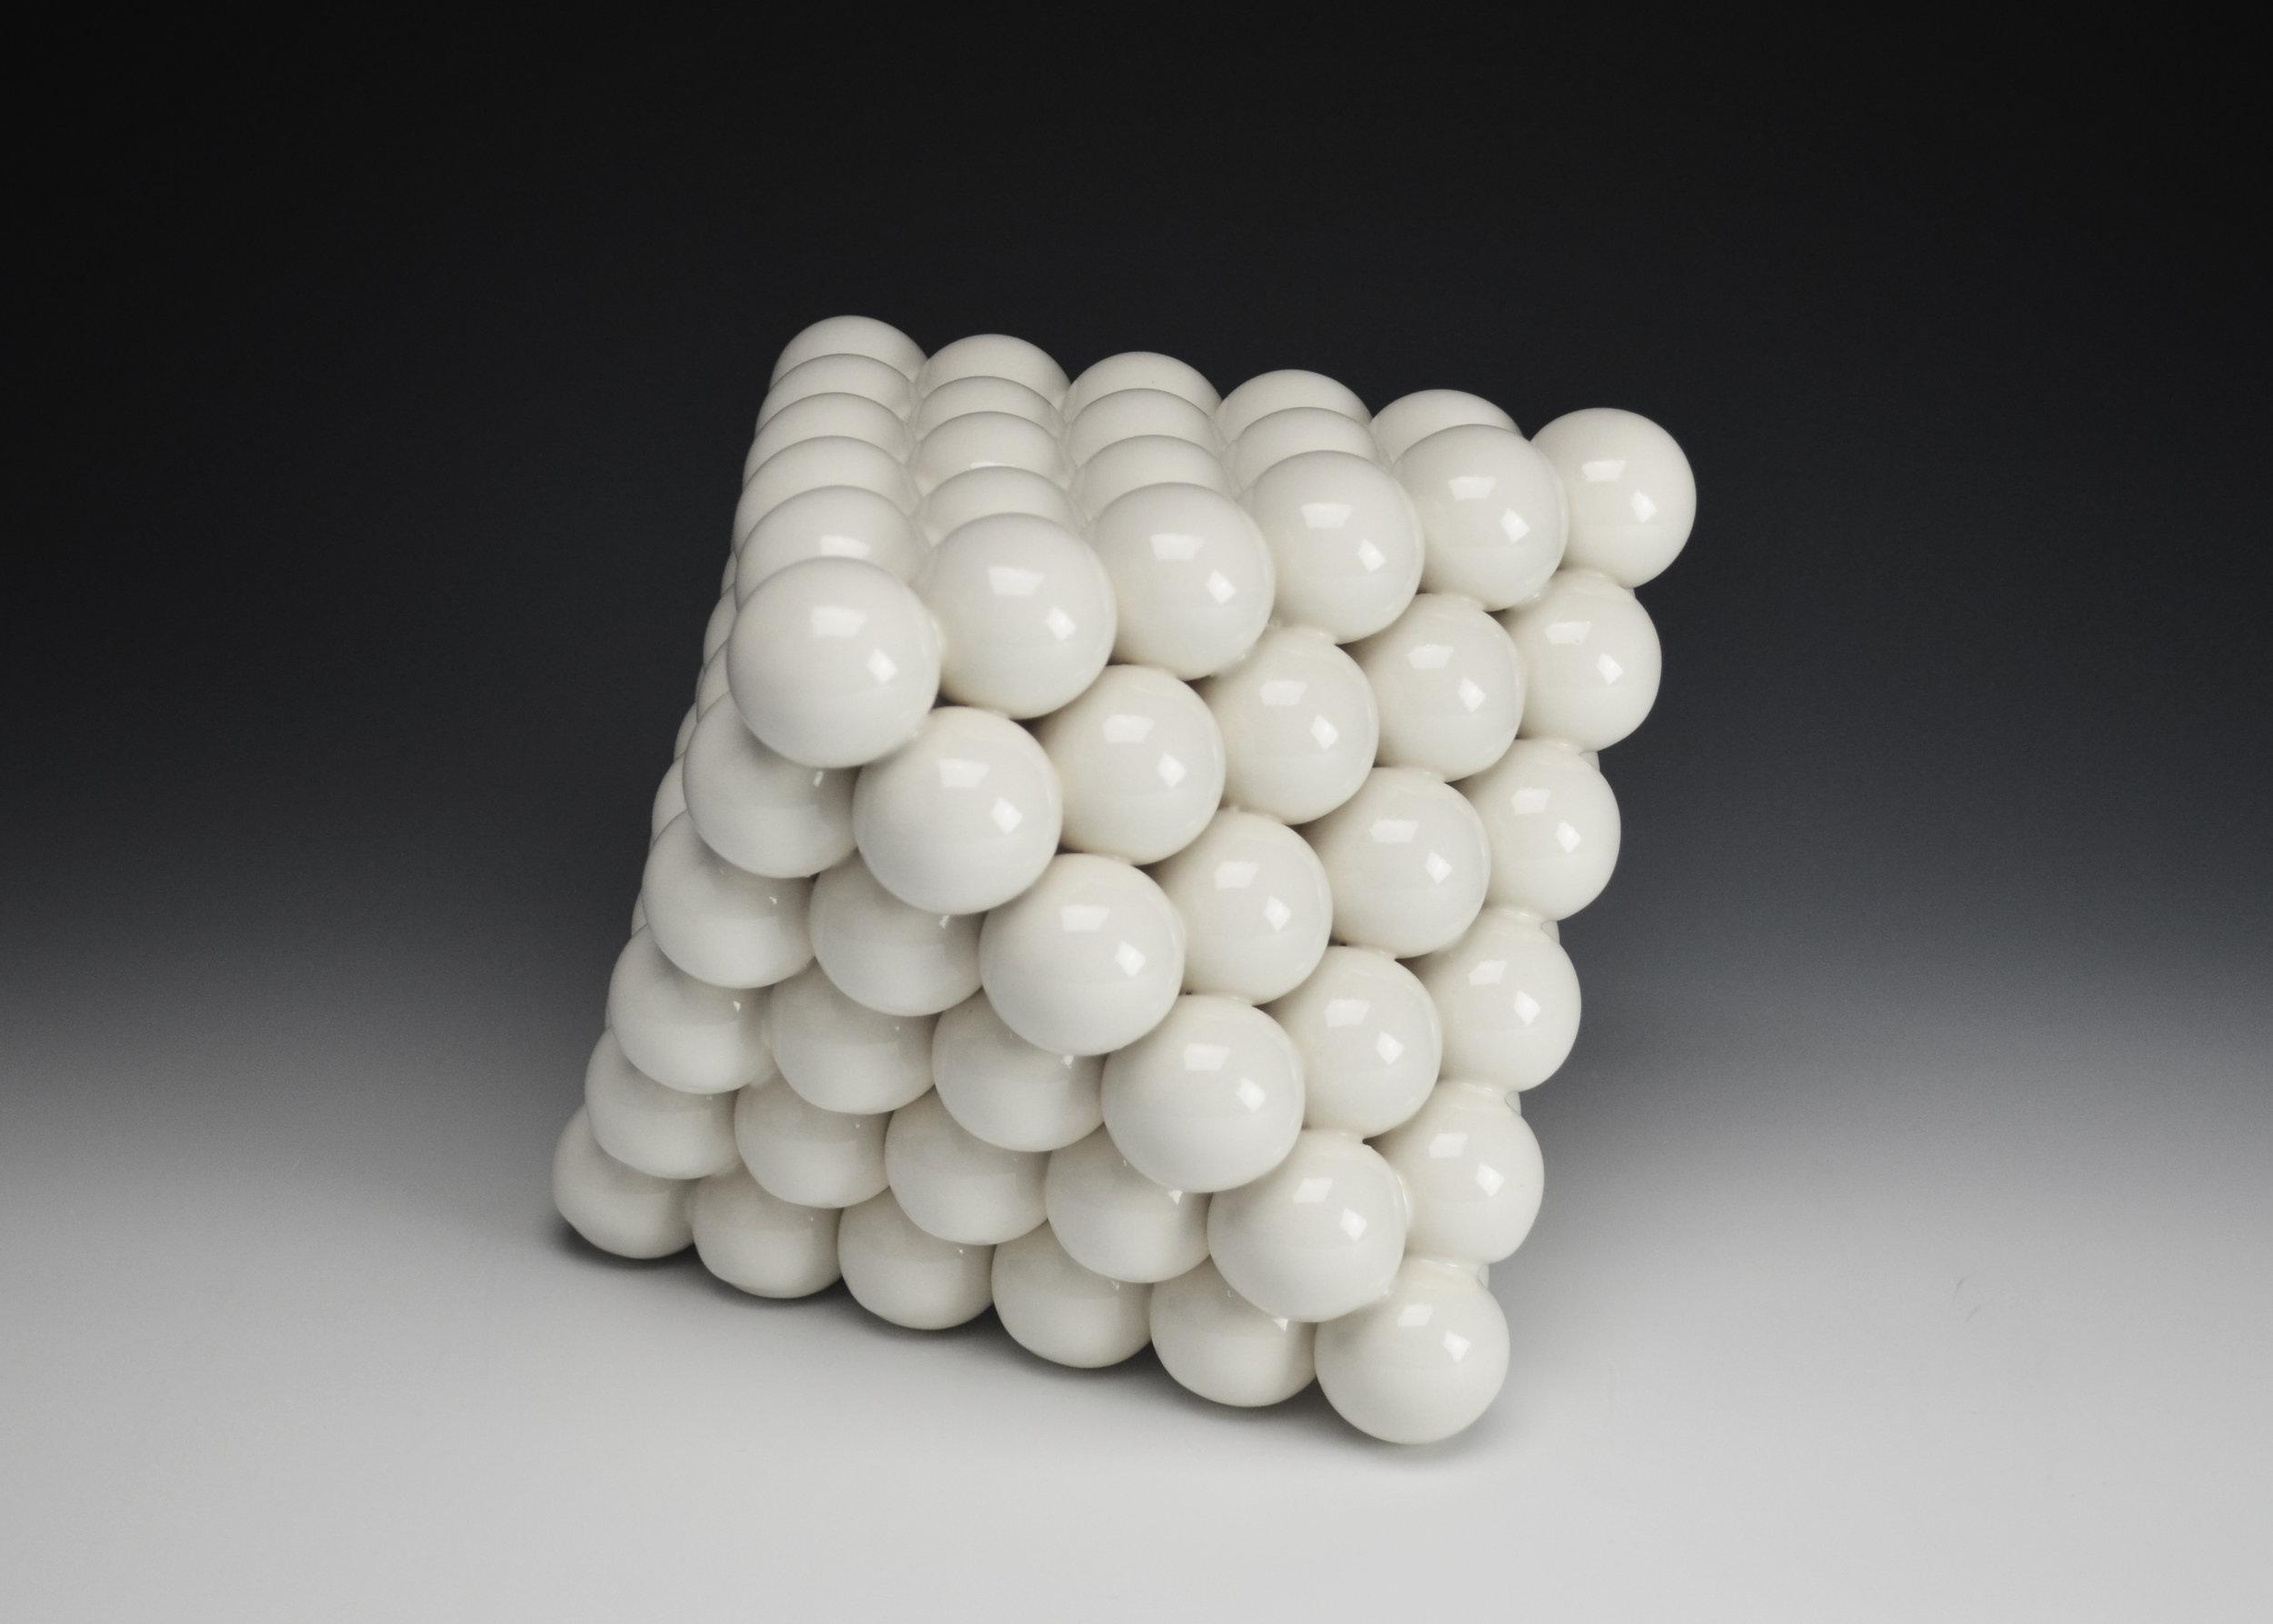 Ionic Series: Octahedron  |  8 x 8 x 12 inches  |  Porcelain, Glaze  |  2017